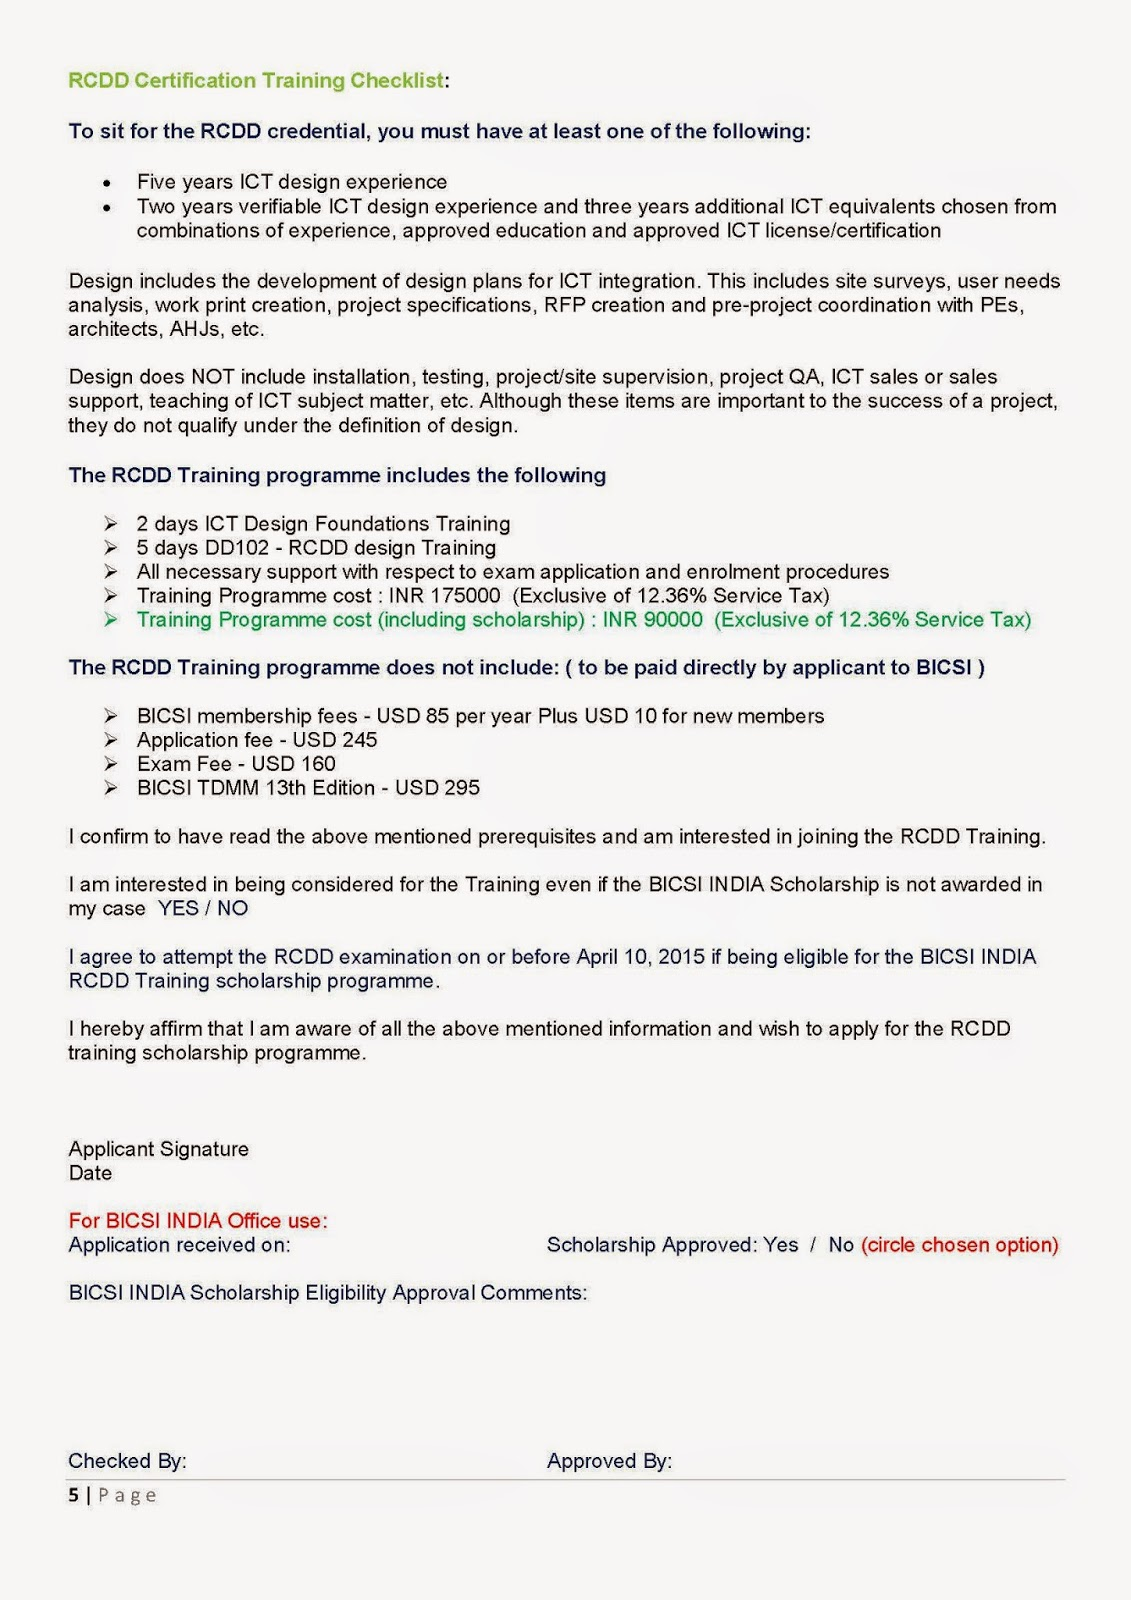 Bicsi India Rcdd Training Scholarship Application Form Bicsi India